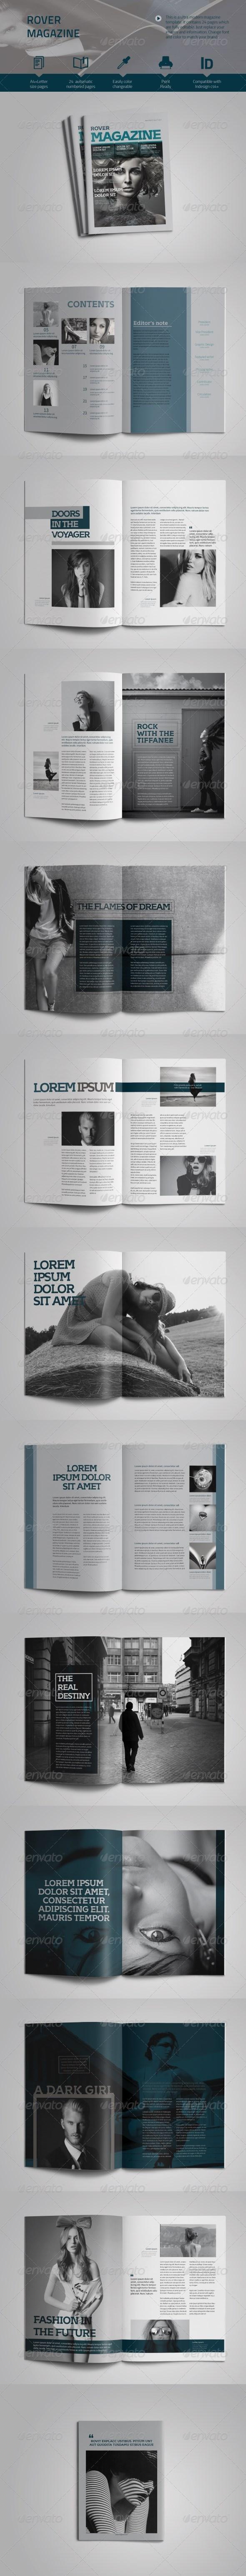 Rover Magazine Vol.1 - Magazines Print Templates